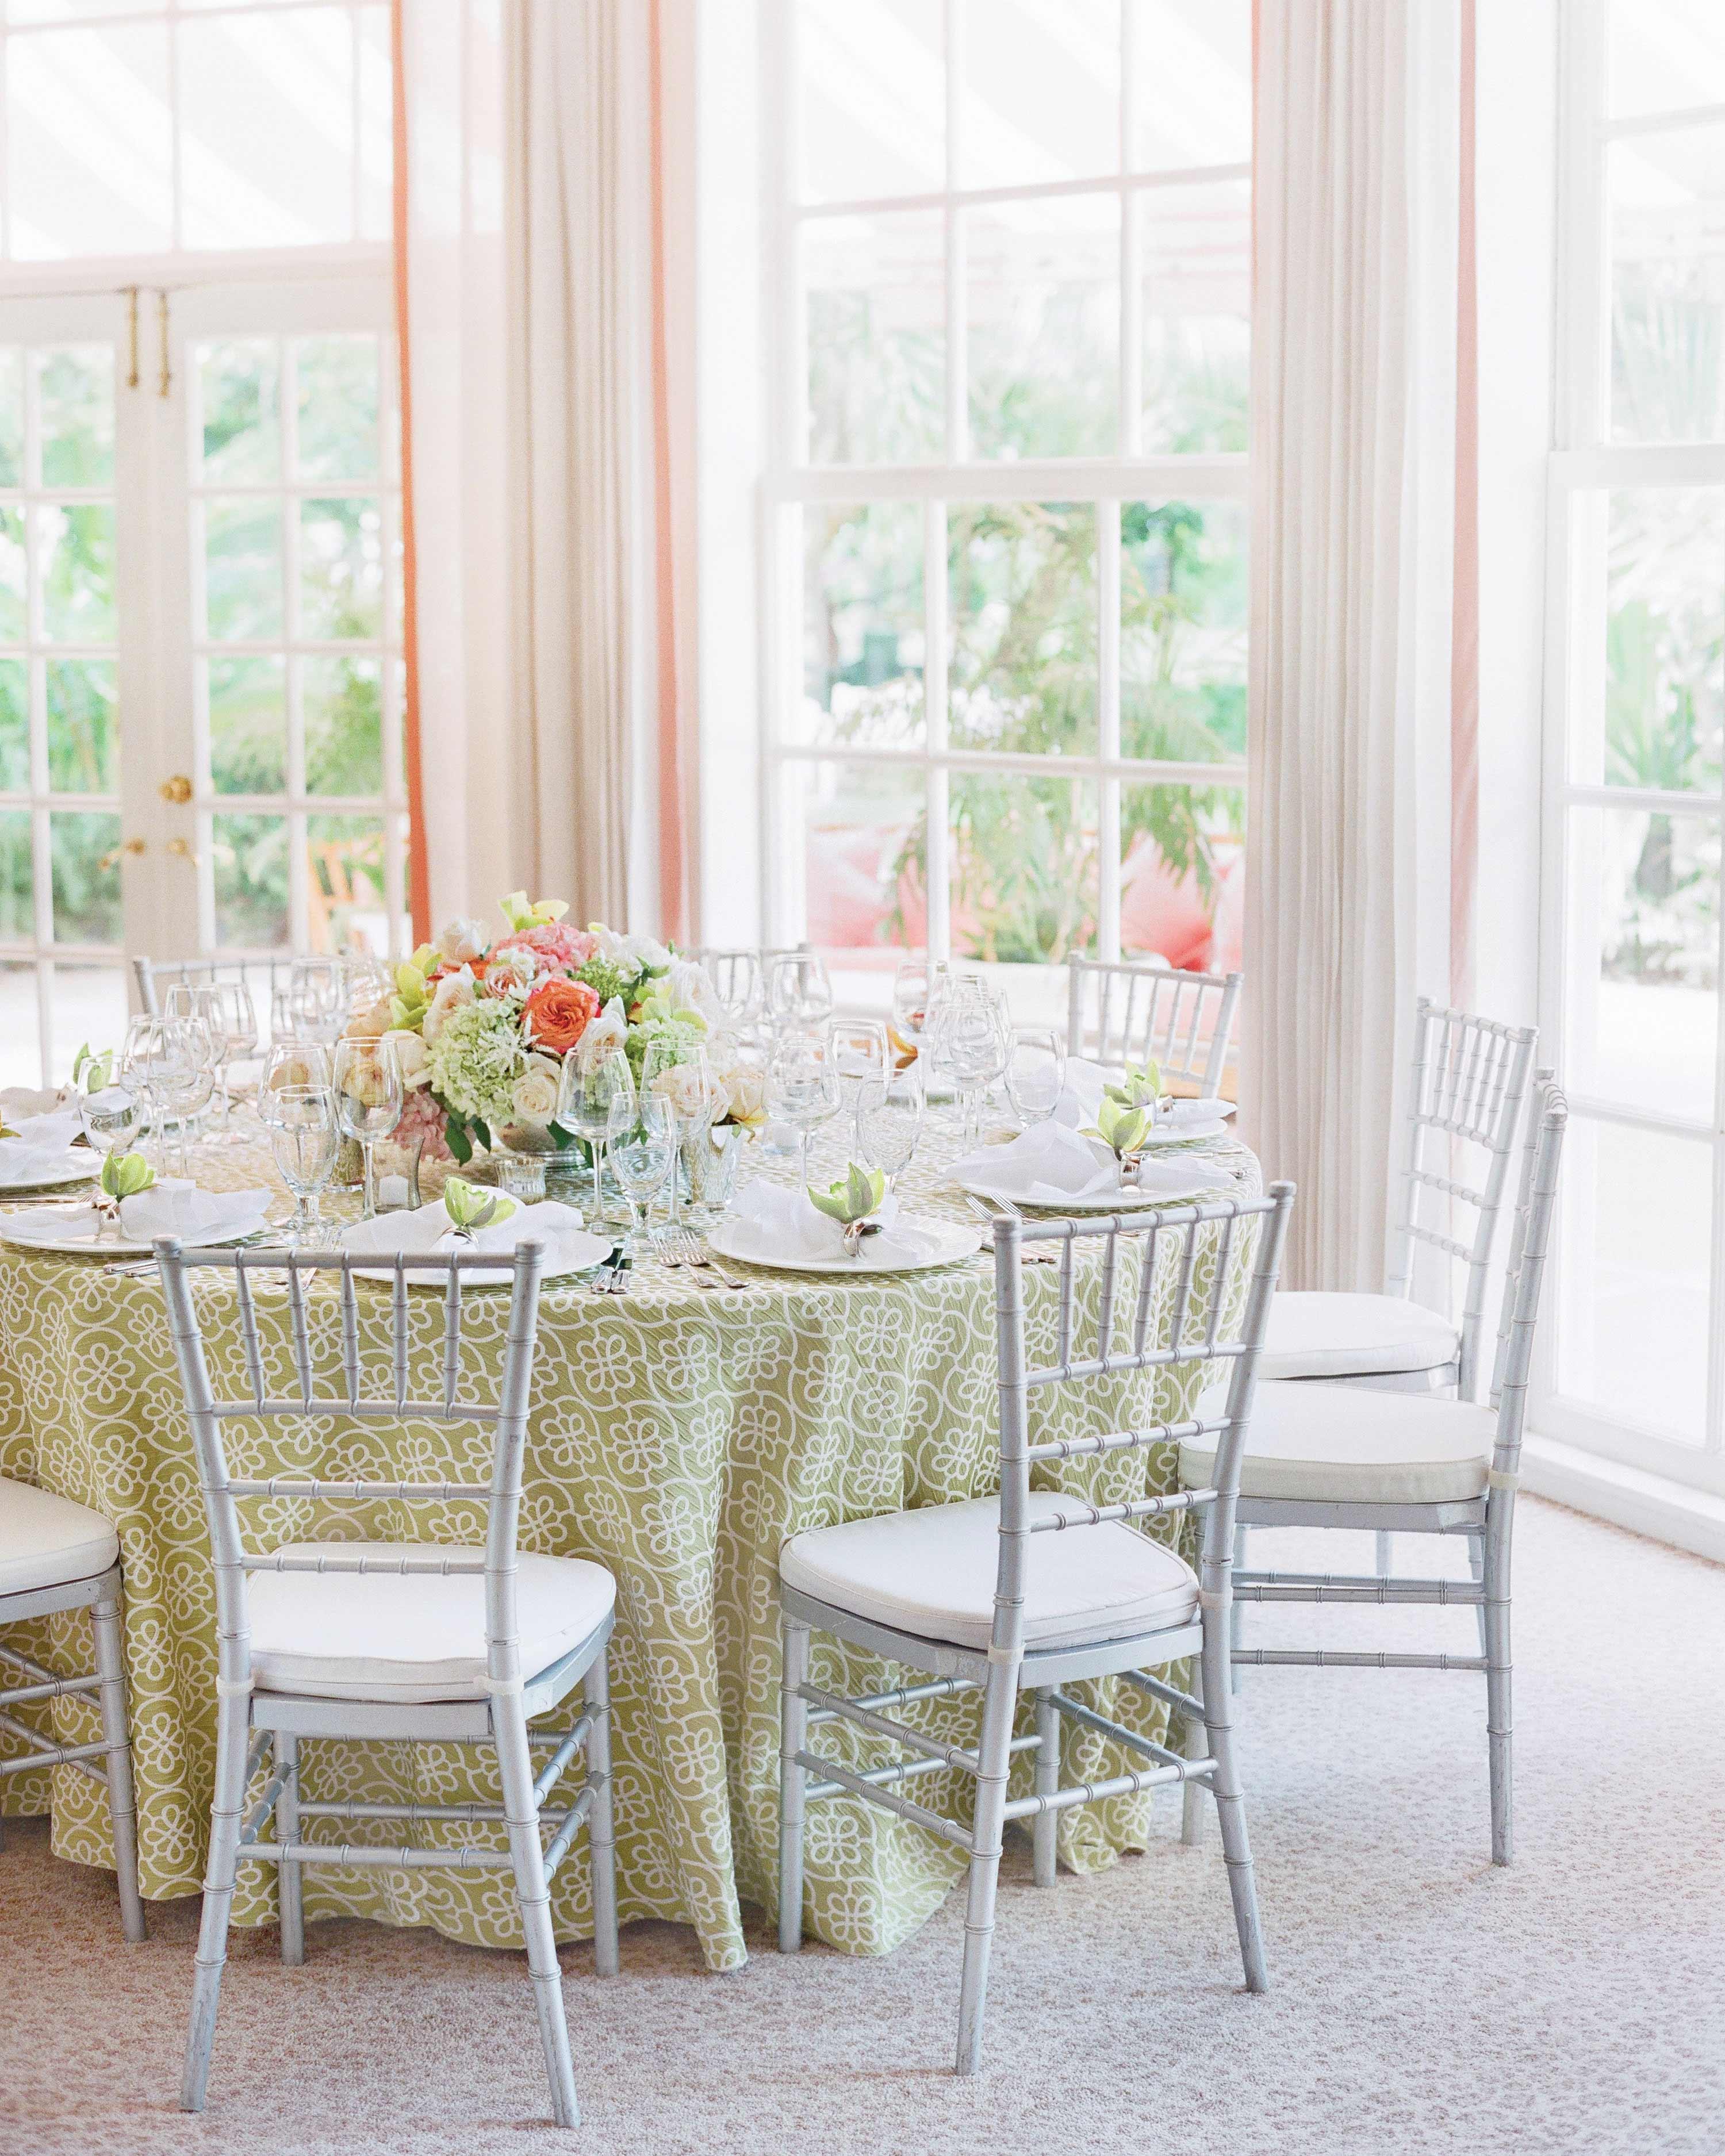 kelsey-casey-real-wedding-reception-table-settings.jpg